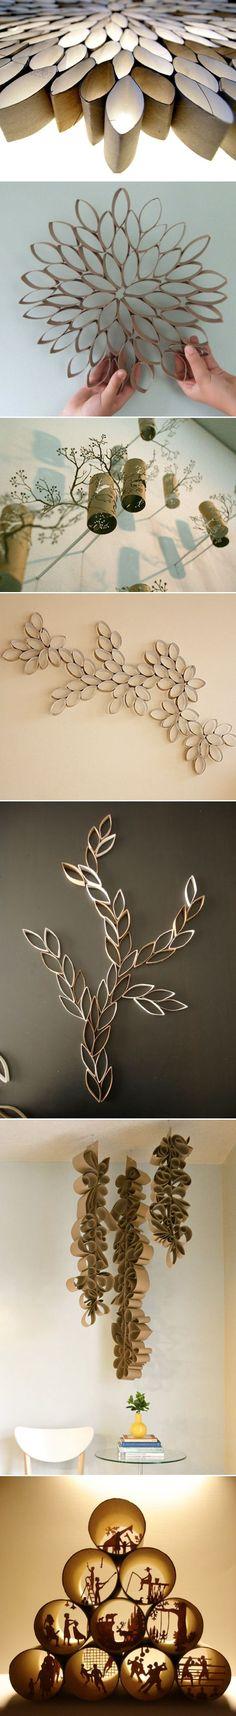 Toilet paper crafts!